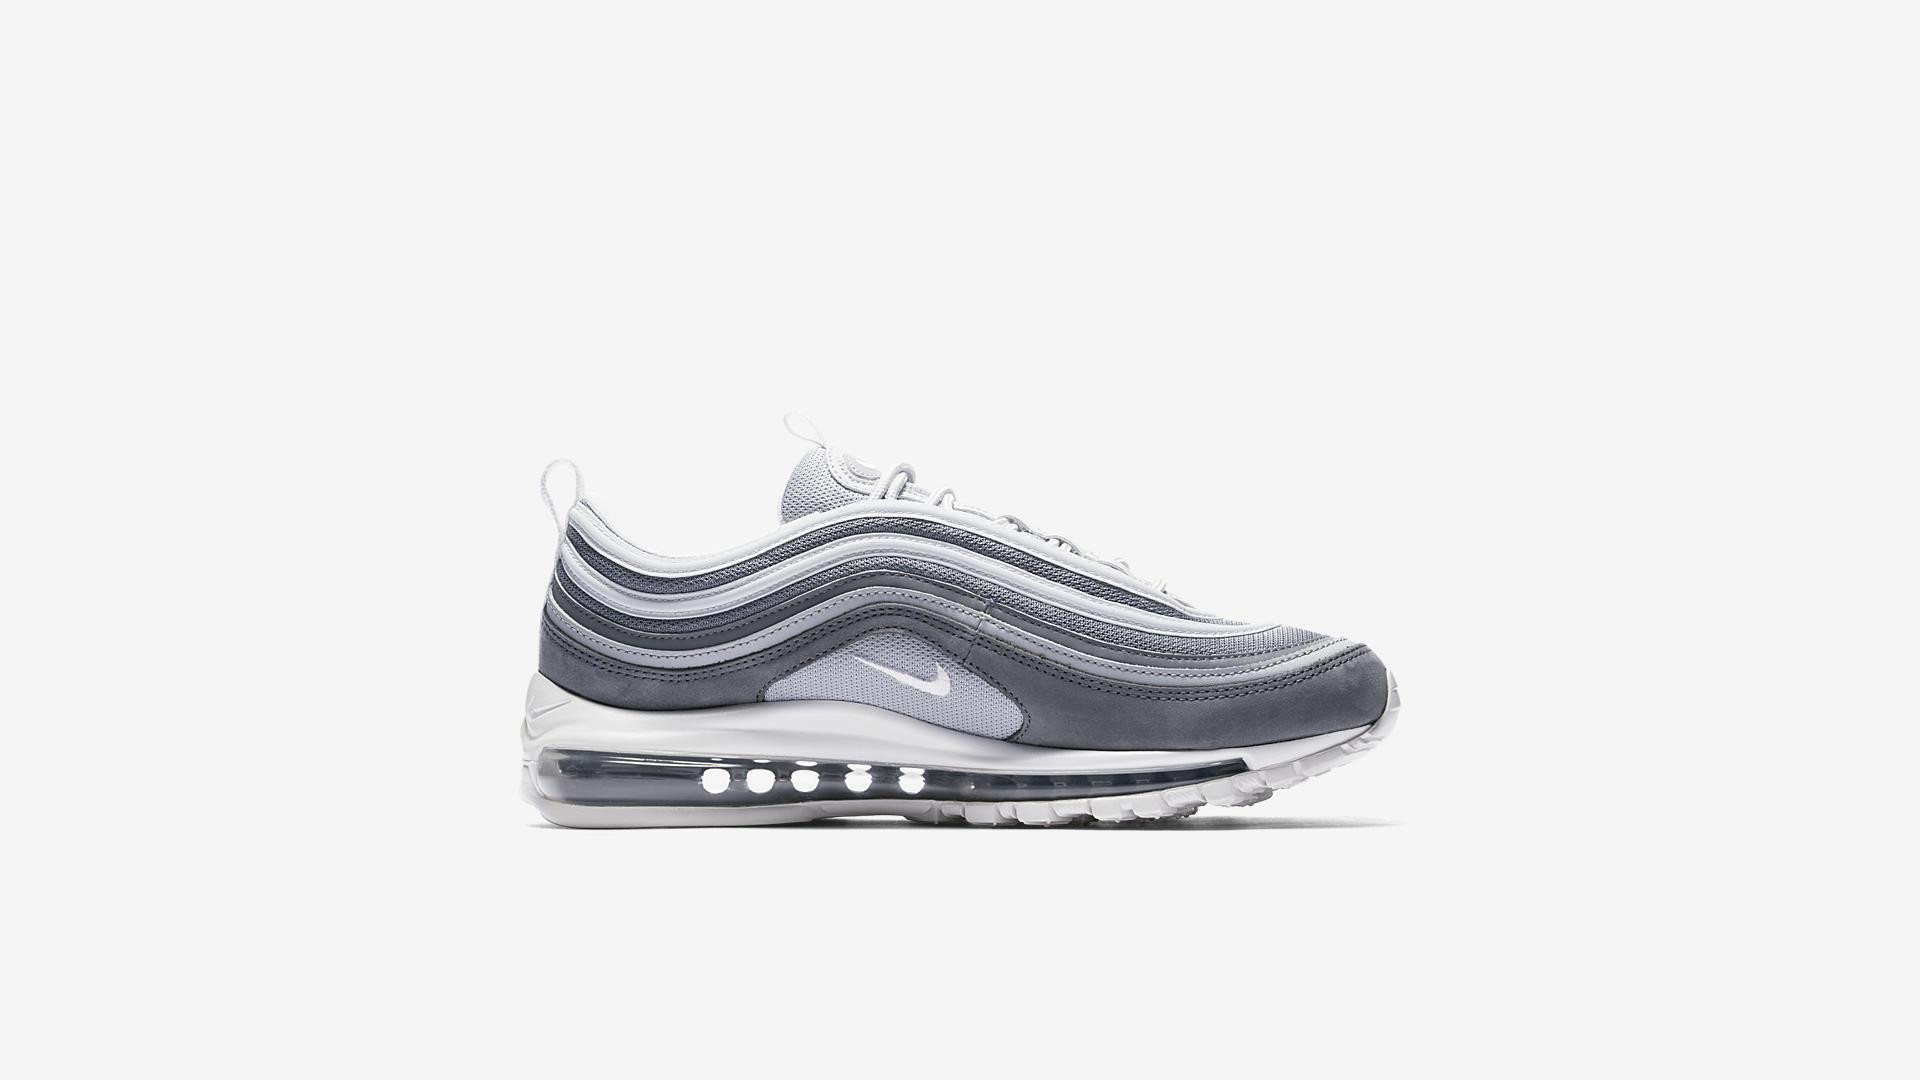 312834 005 Nike Air Max 97 PRM Wolf Grey 4